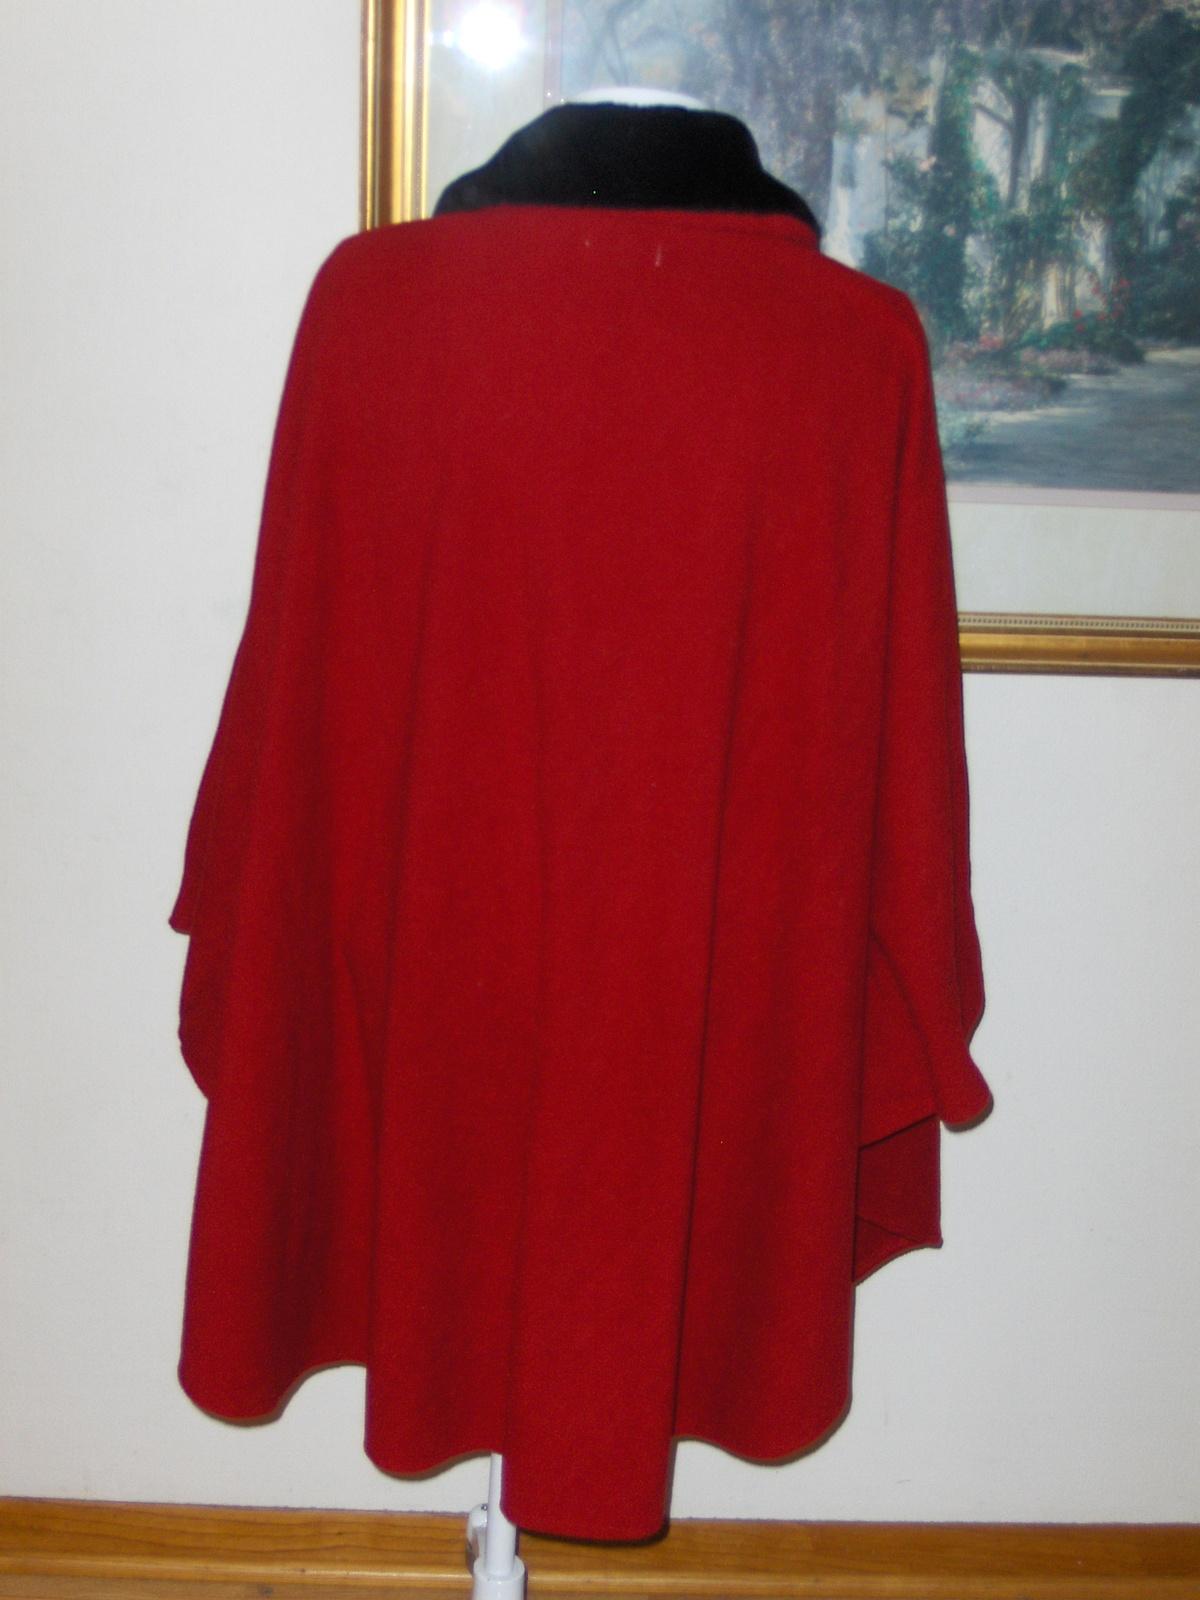 Le Moda Red Cape Poncho Rosette Trim Pockets One Size 4817-417